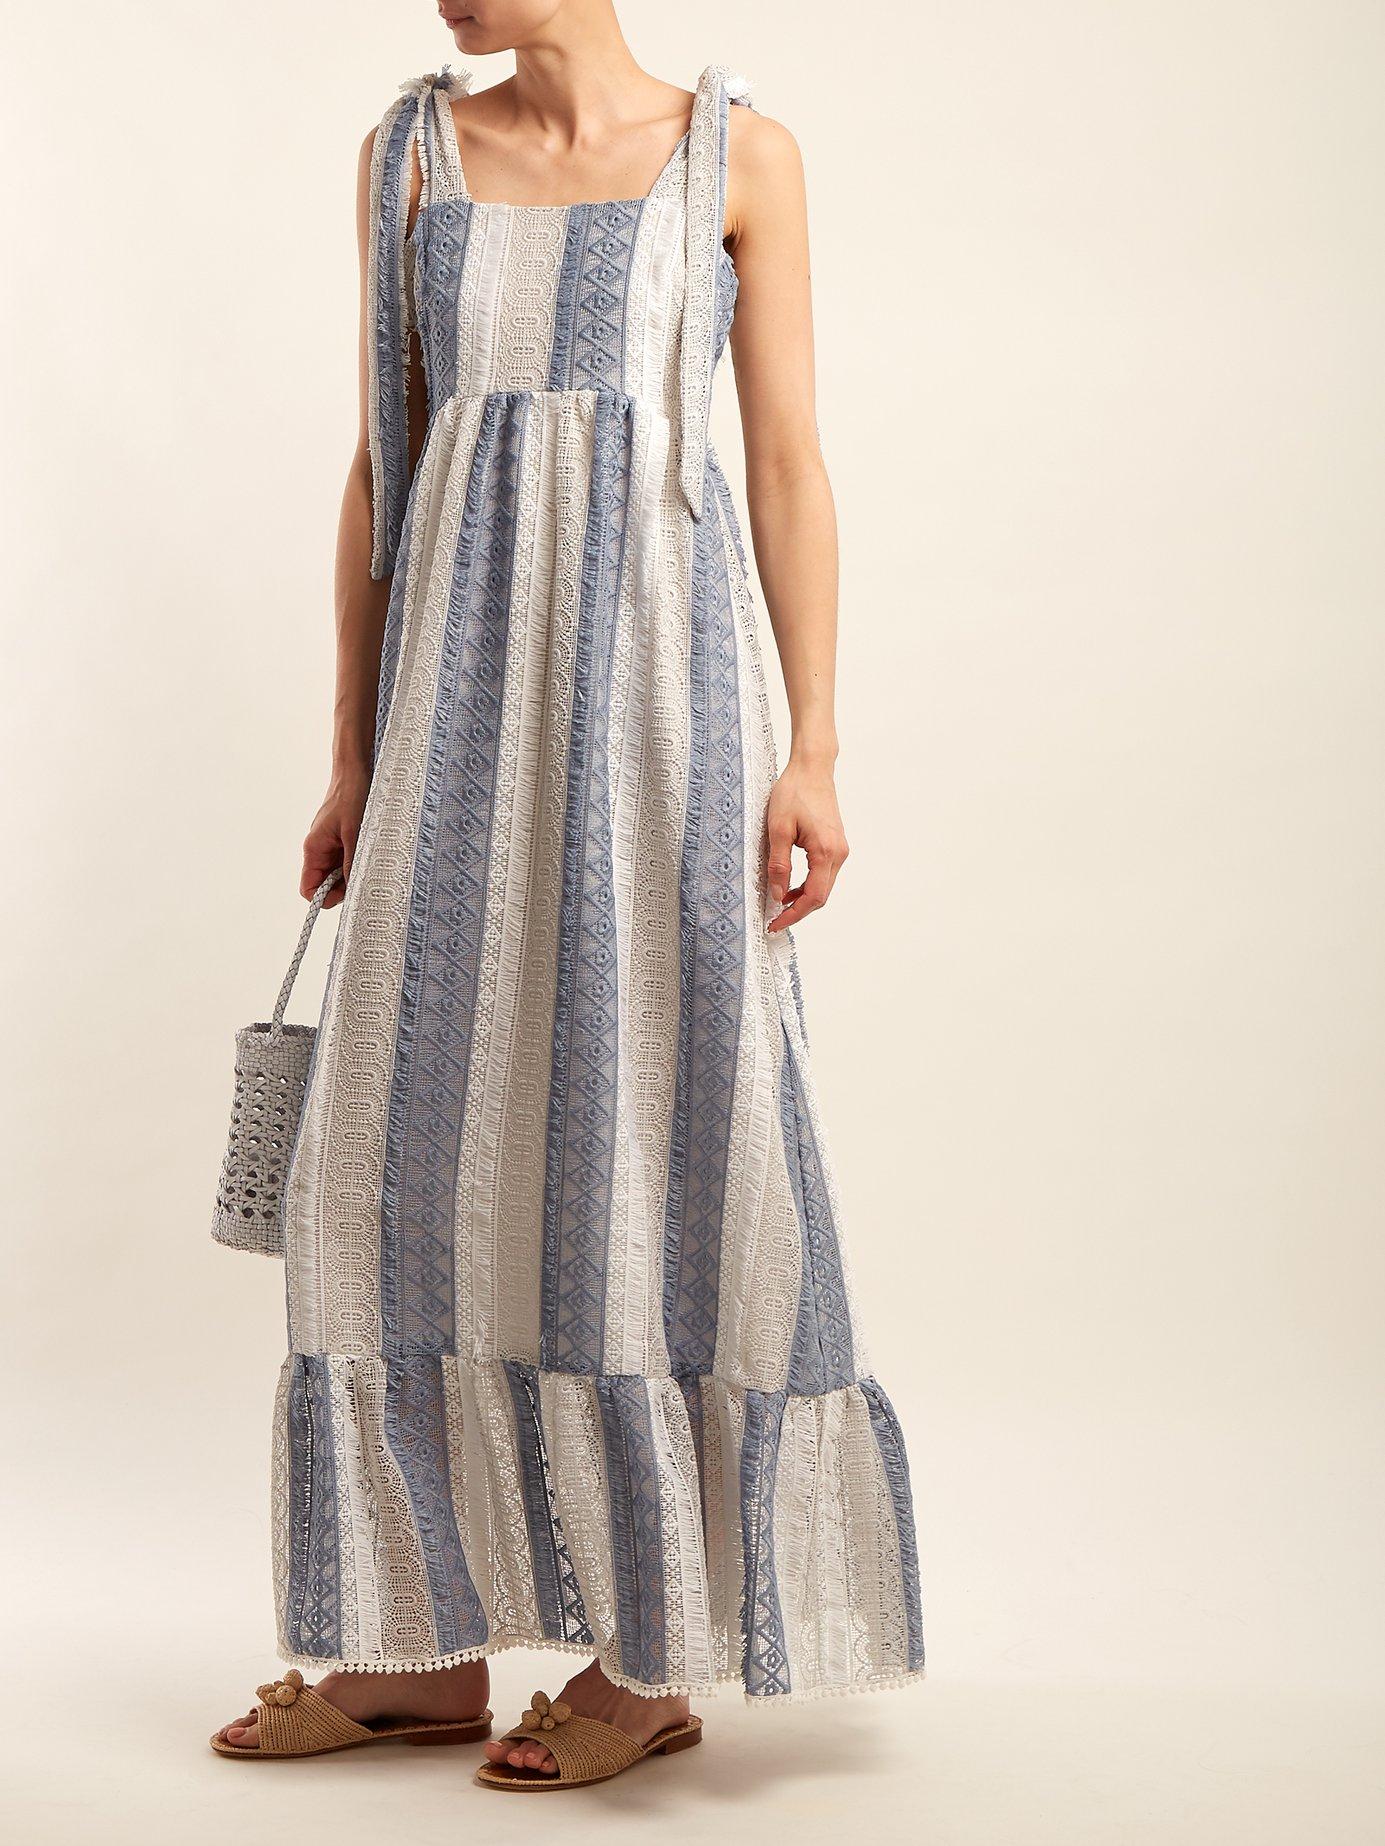 Tie-shoulder lace dress by Athena Procopiou